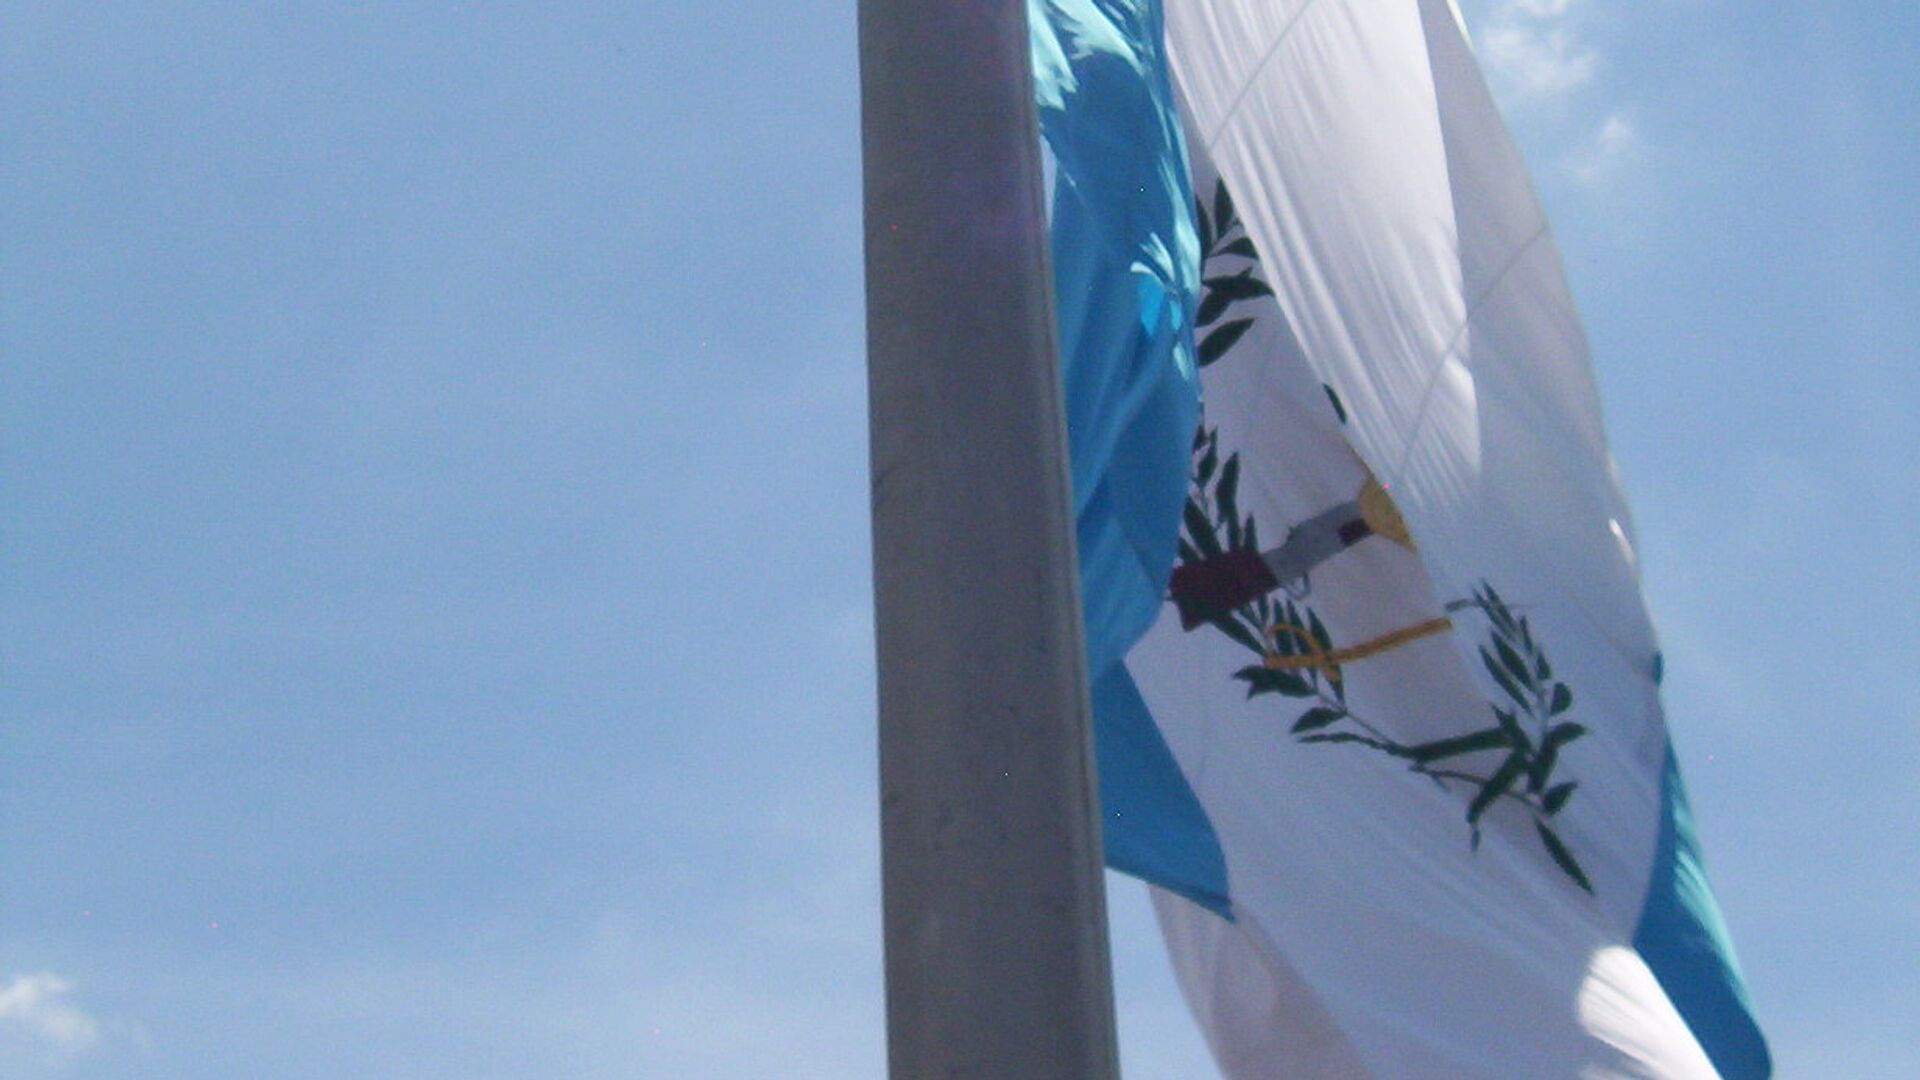 Bandera de Guatemala - Sputnik Mundo, 1920, 12.04.2021